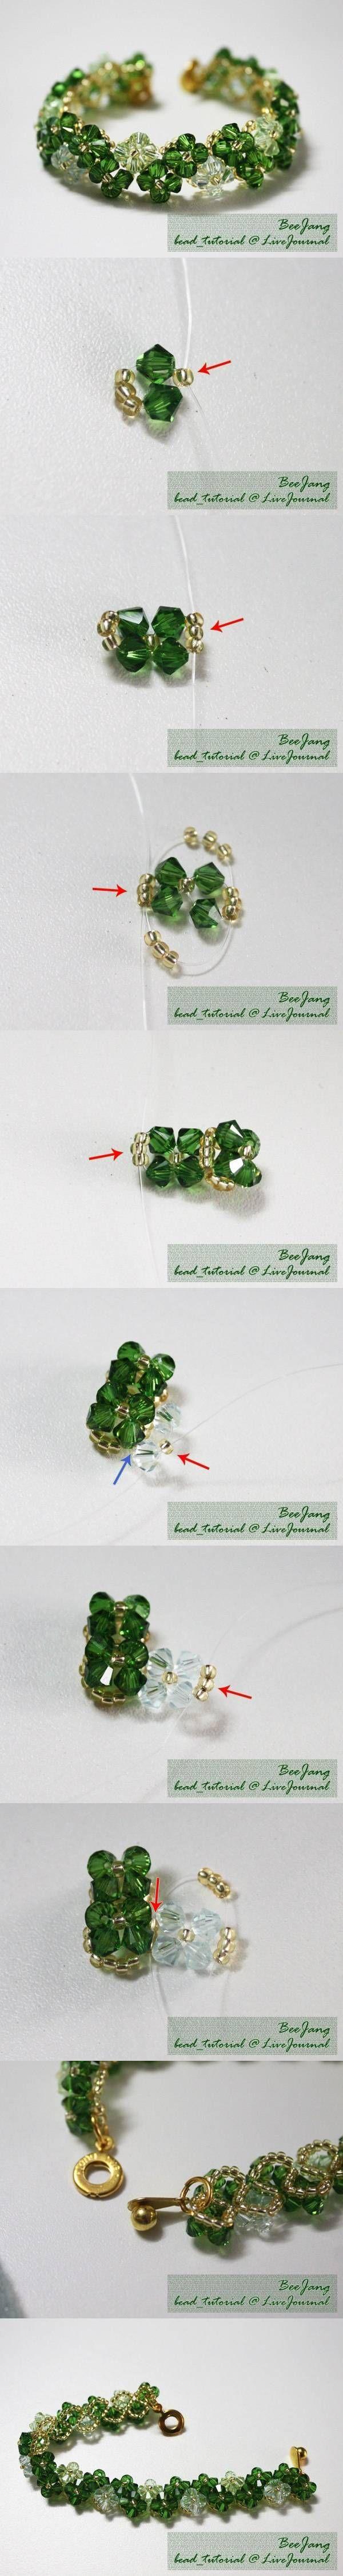 DIY Transparent Beads Bracelet  oh my gosh I want this bracelet